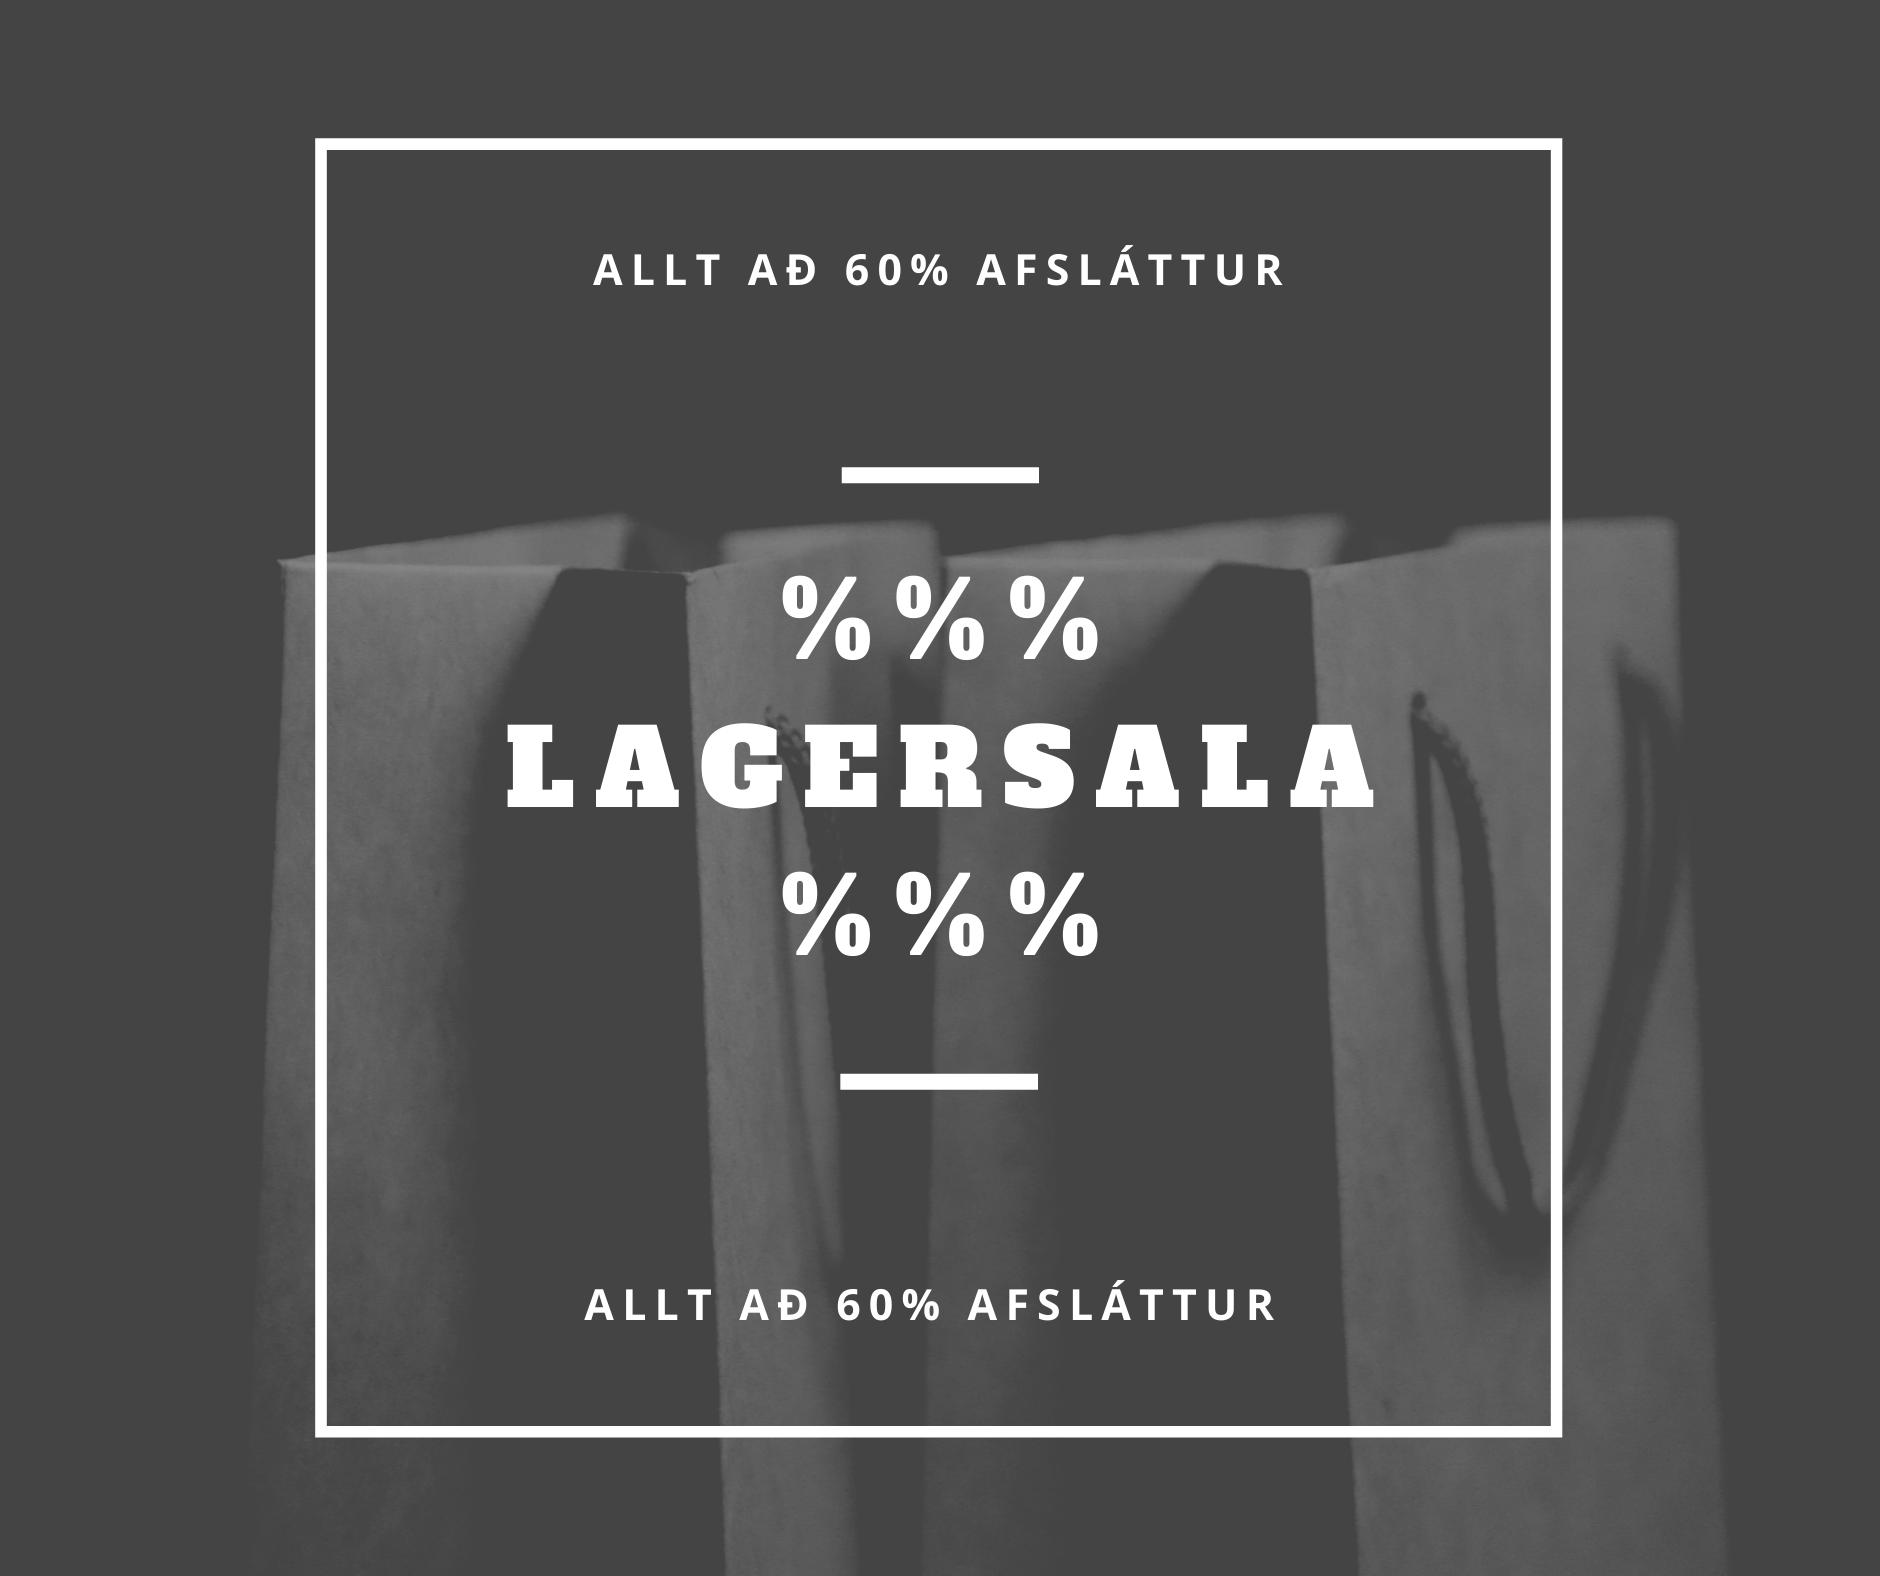 Lagersala